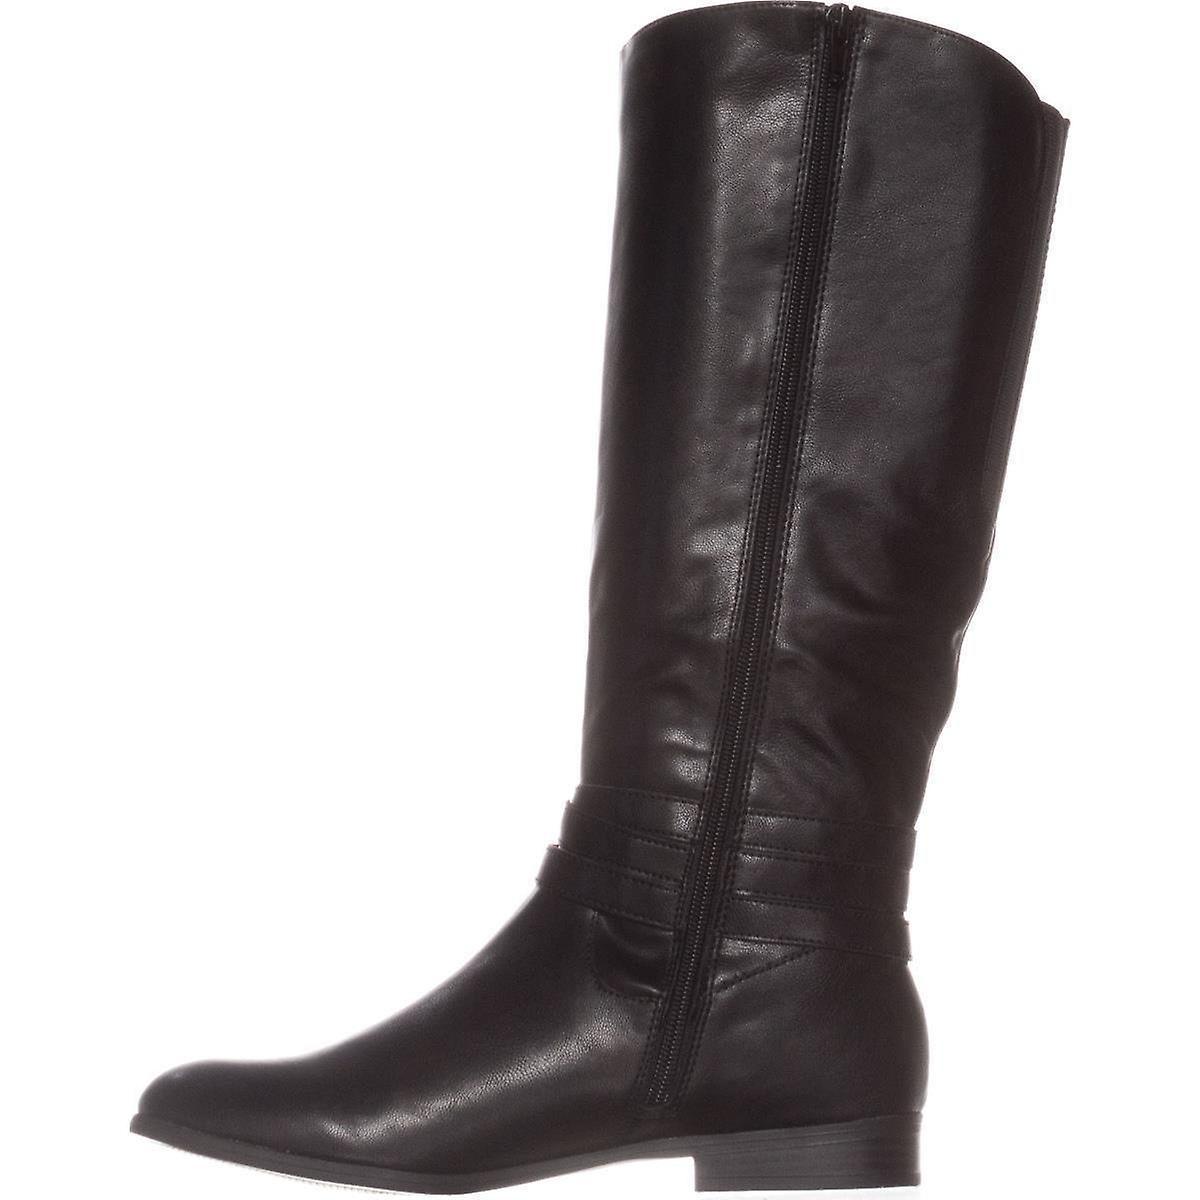 Style /& Co Womens KEPPURWC Almond Toe Mid-Calf Fashion Boots